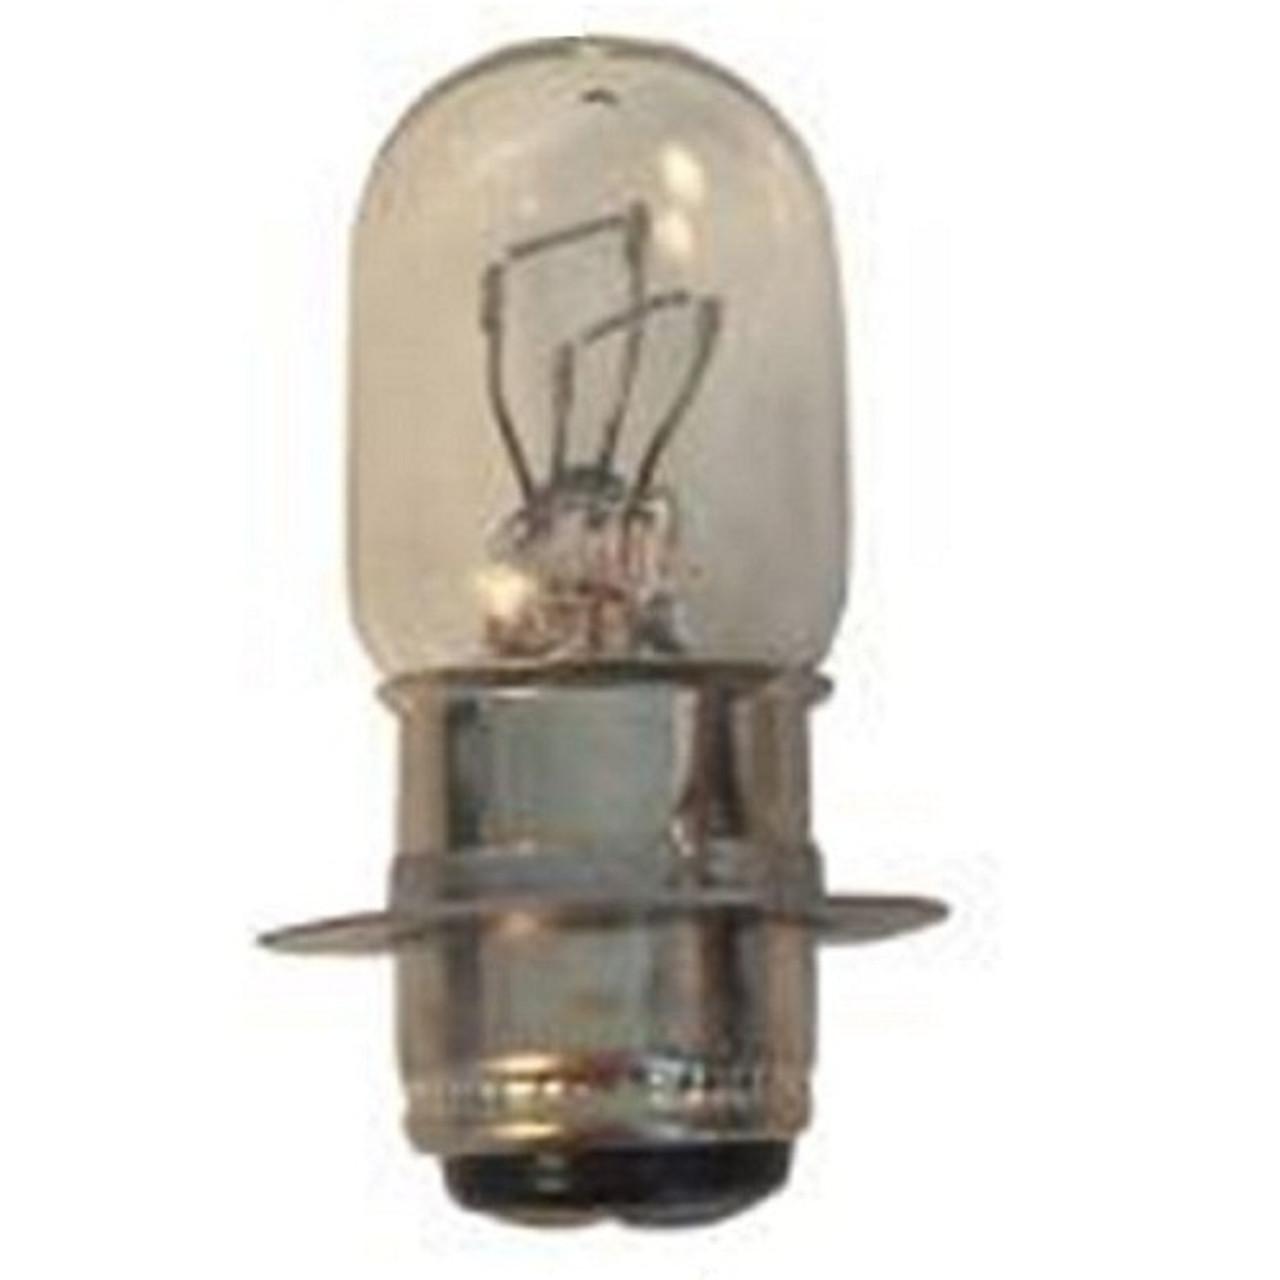 Headlight Bulb for ATA 110 B/B1 110214